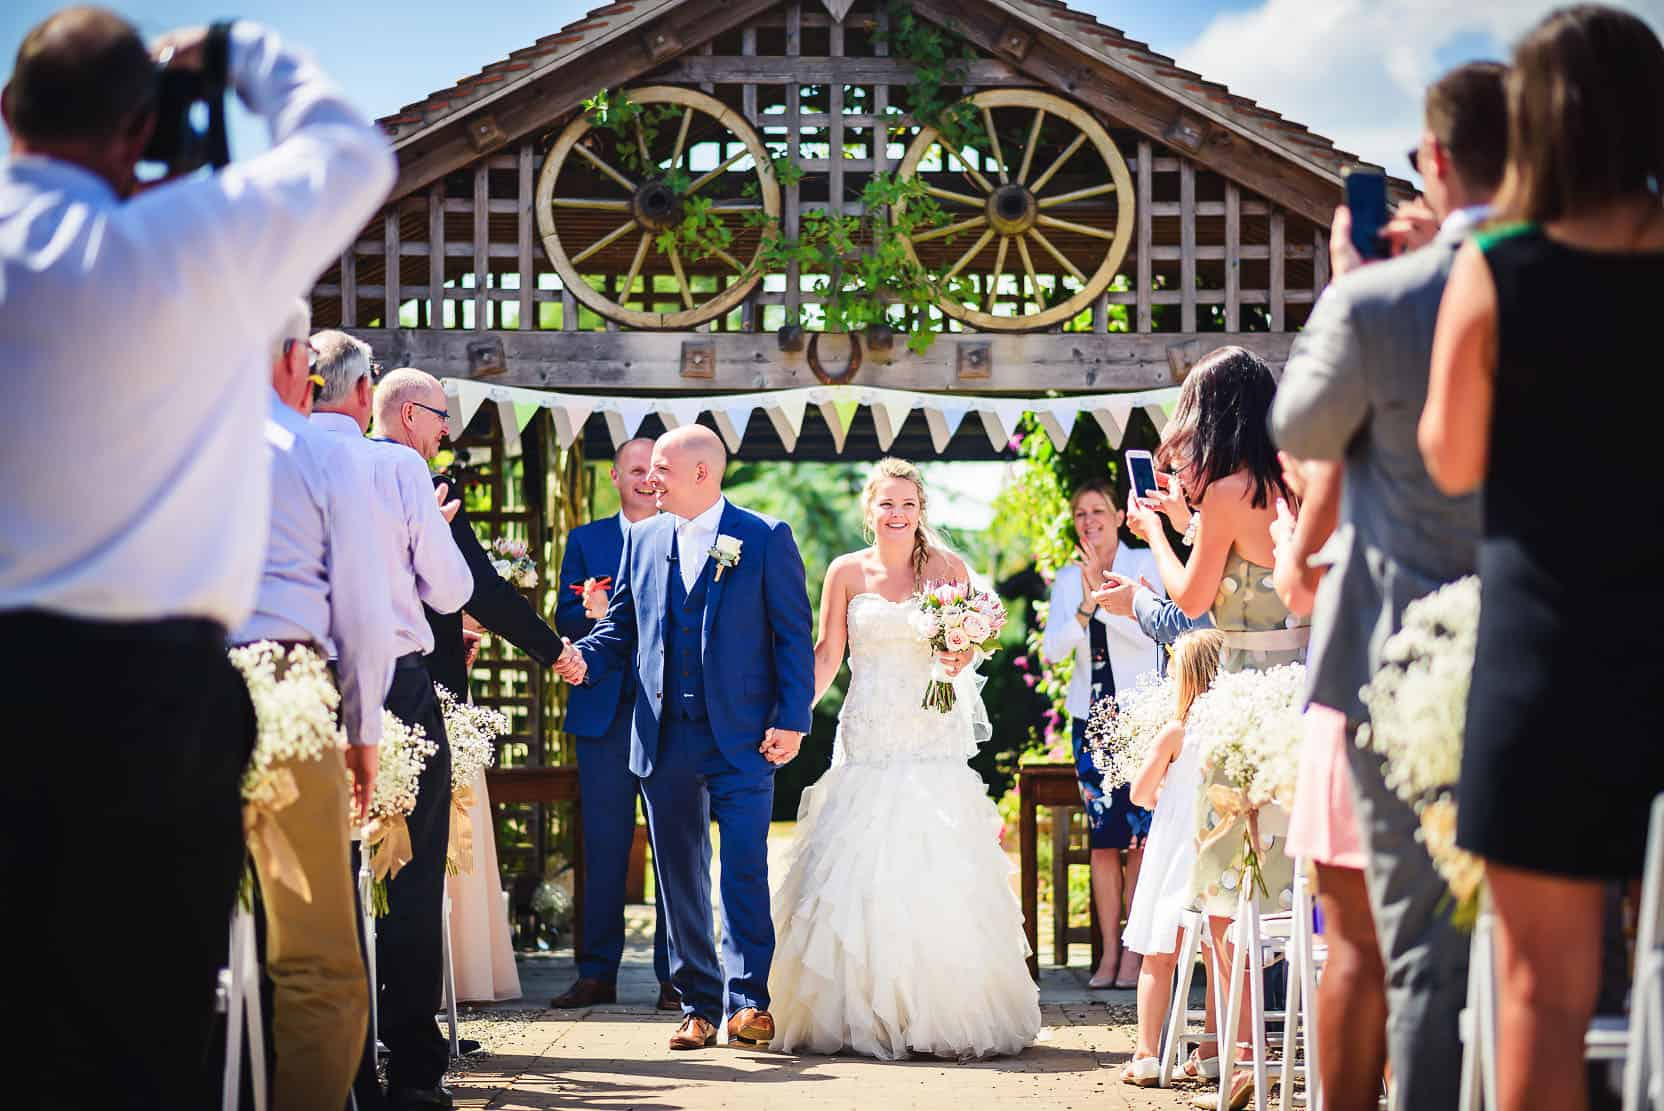 017_Maidens_Barn_Wedding_Essex_NJ_Justin_Bailey_Photography